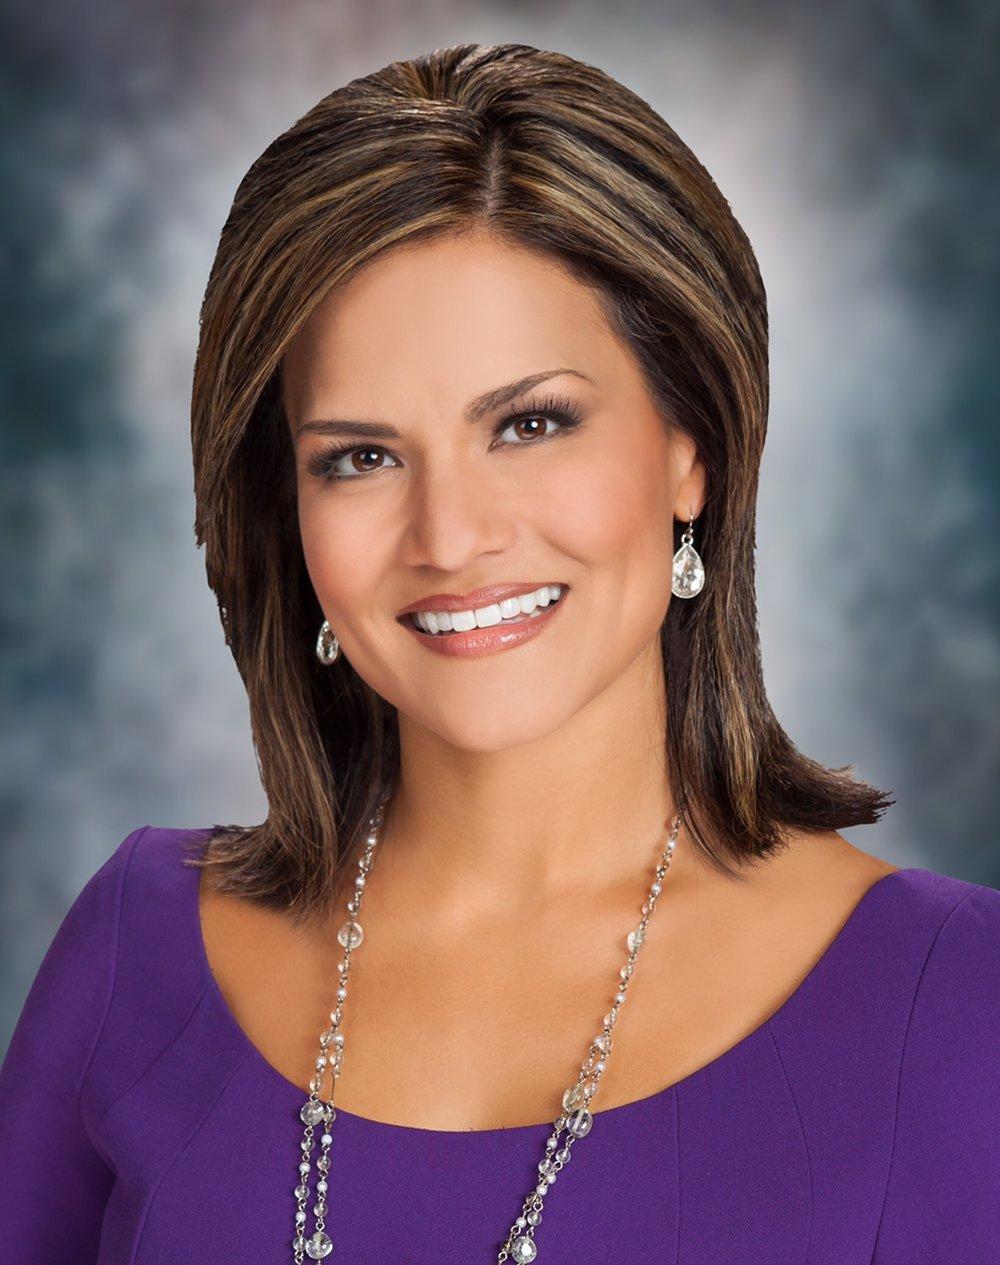 Nicole Crites